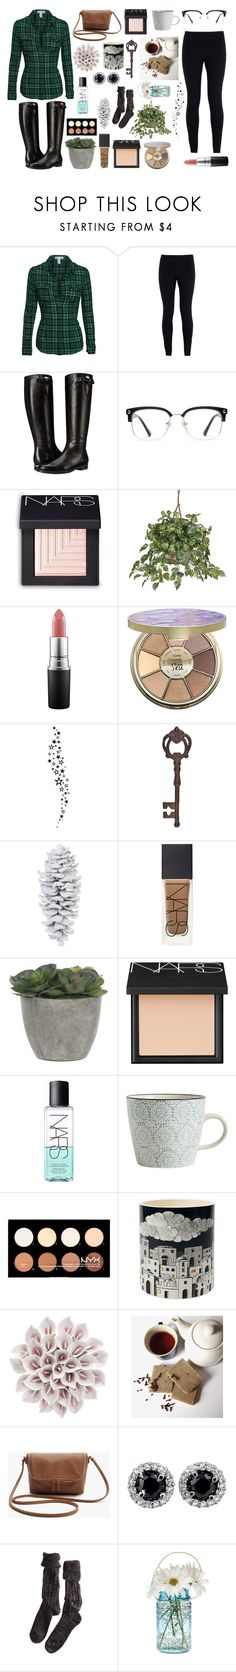 """~ Trees ~"" by artamus on Polyvore featuring NIKE, Burberry, GlassesUSA, NARS Cosmetics, MAC Cosmetics, tarte, True Fabrications, Coach House, Lux-Art Silks and Nordal"